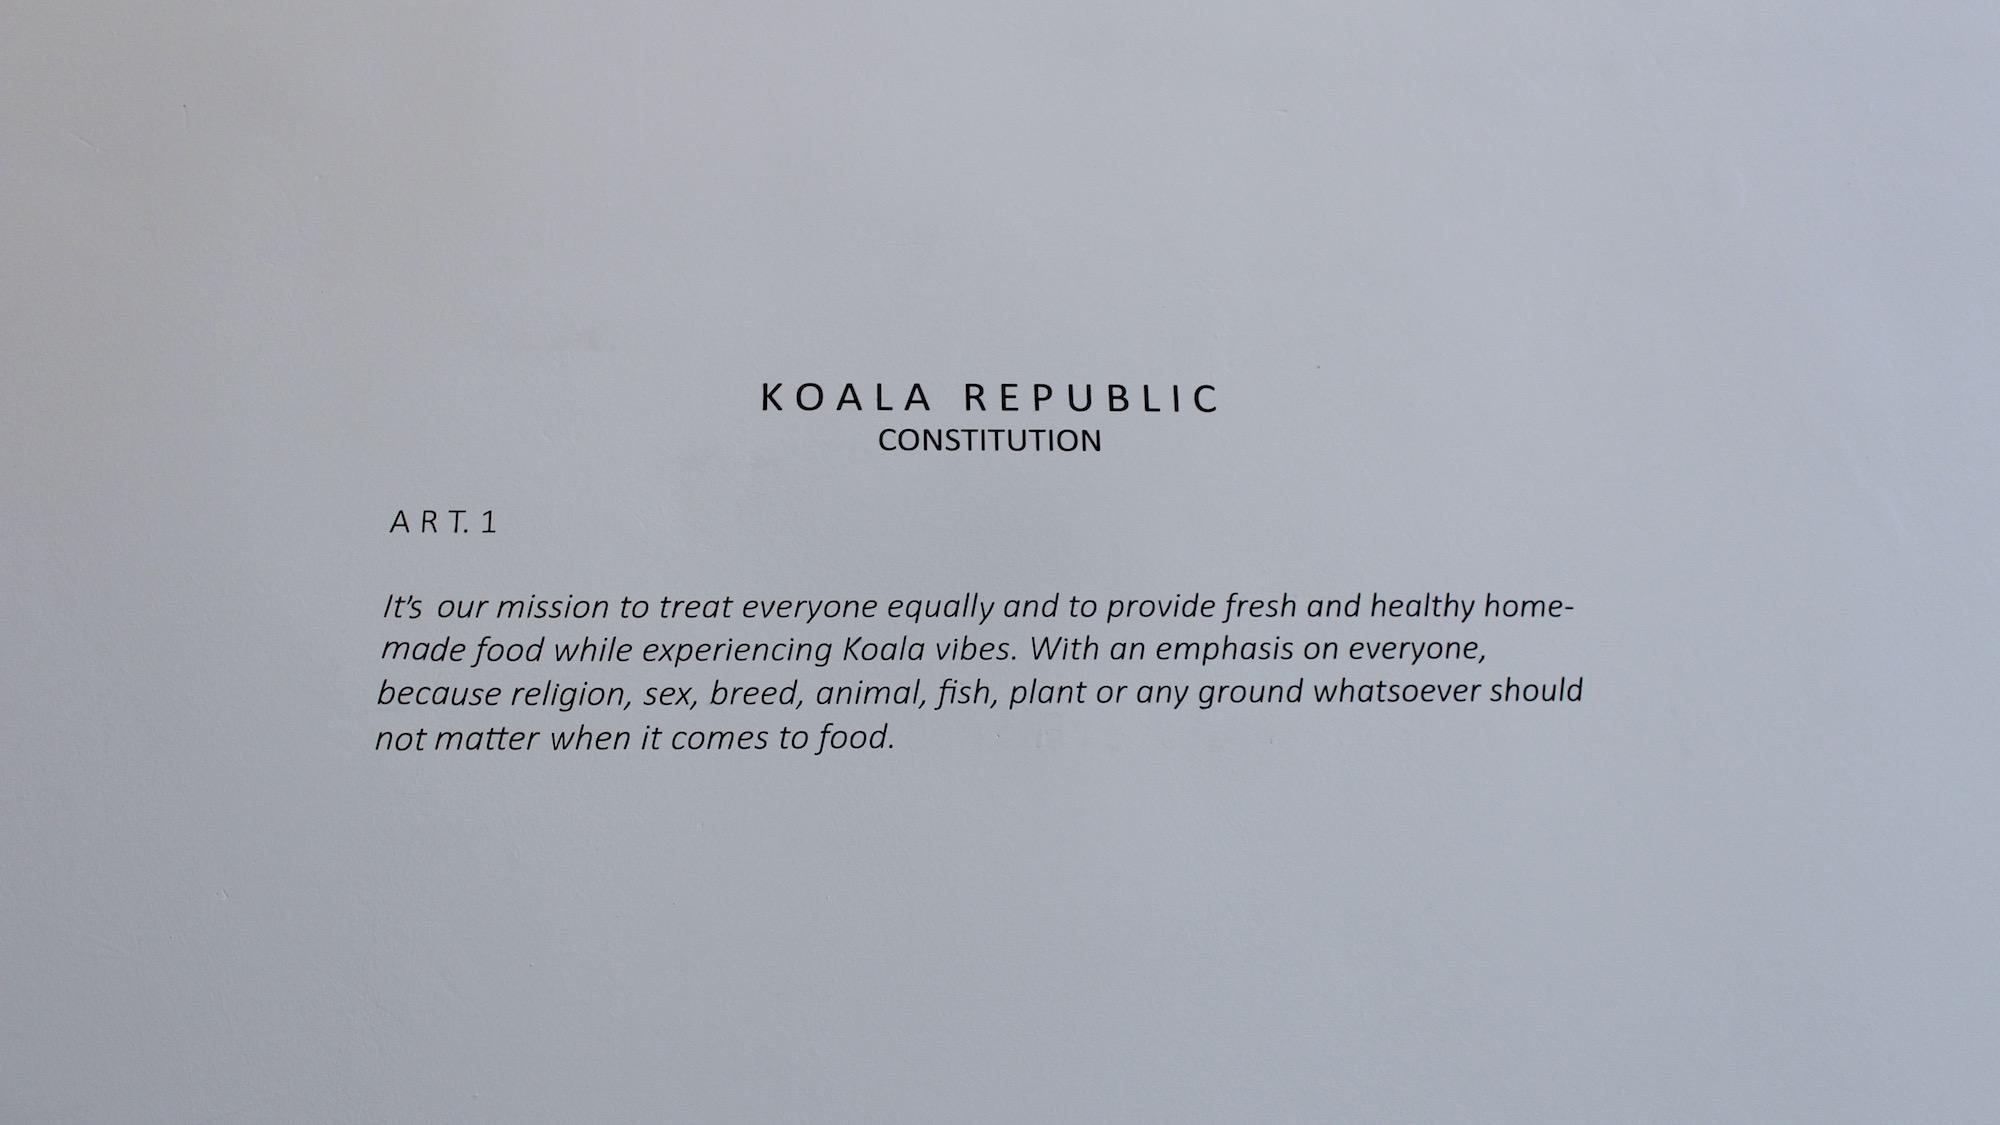 Koala Republic